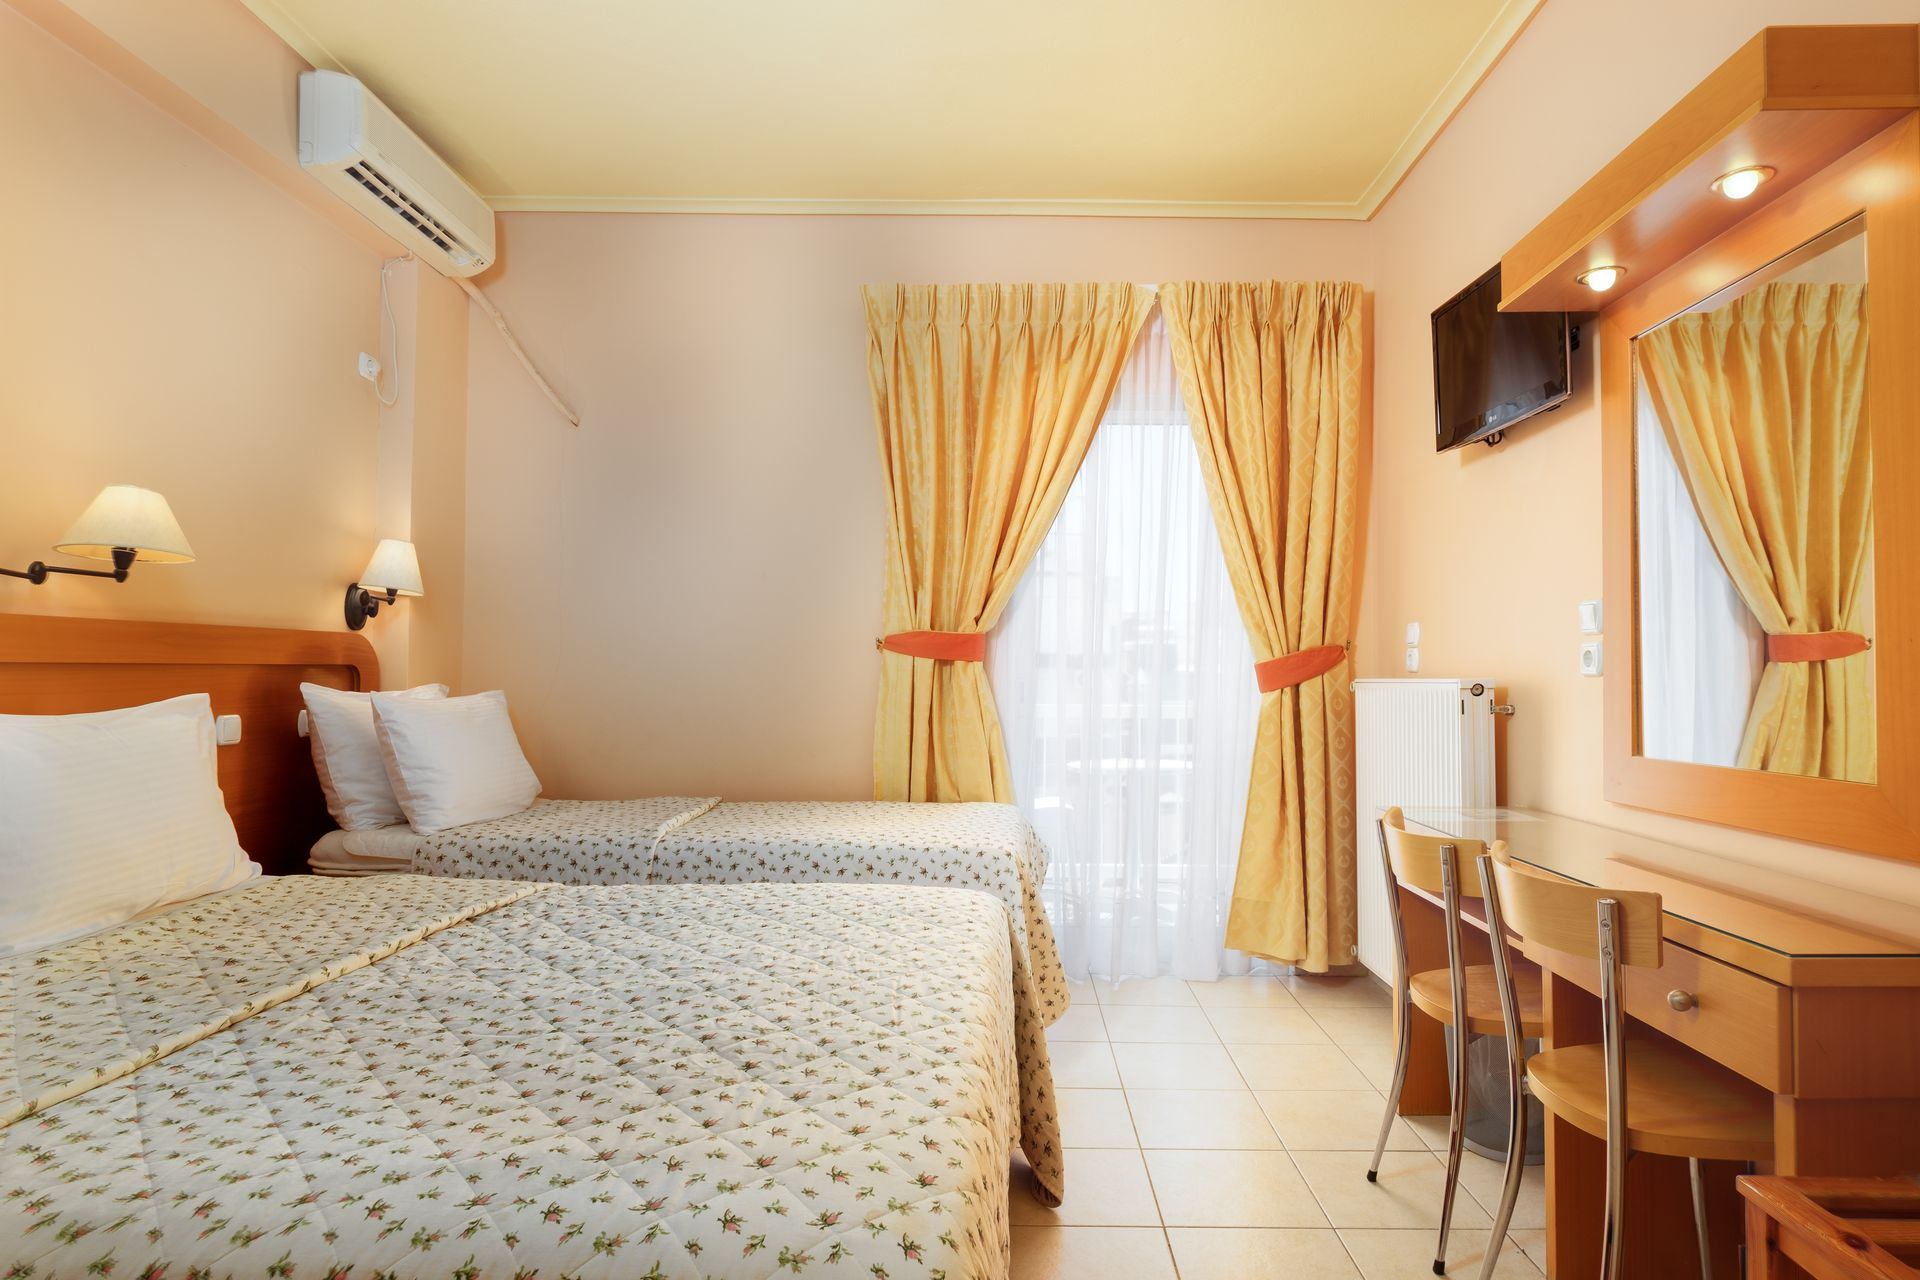 _44_ 0120_2020_44_hotel segas-edit_resized